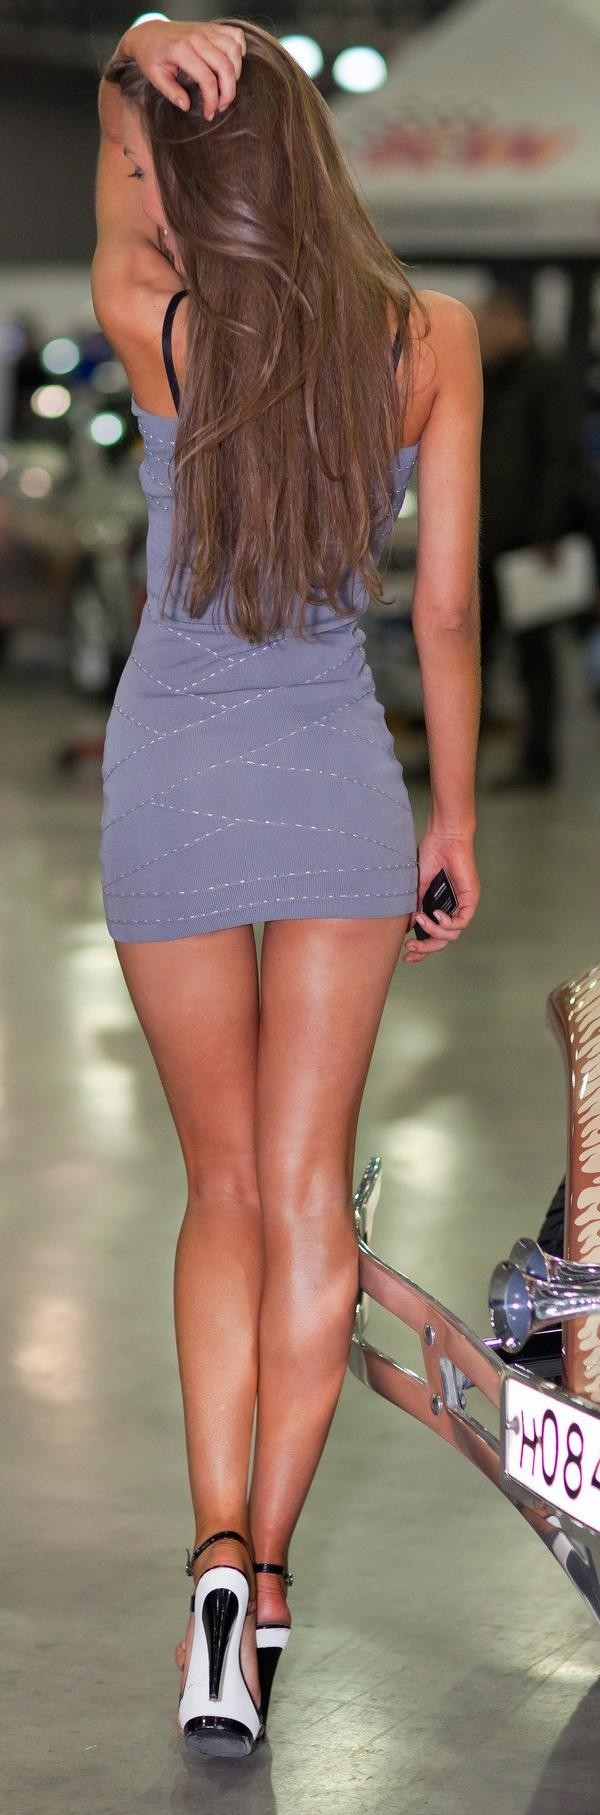 Long legs tight dress